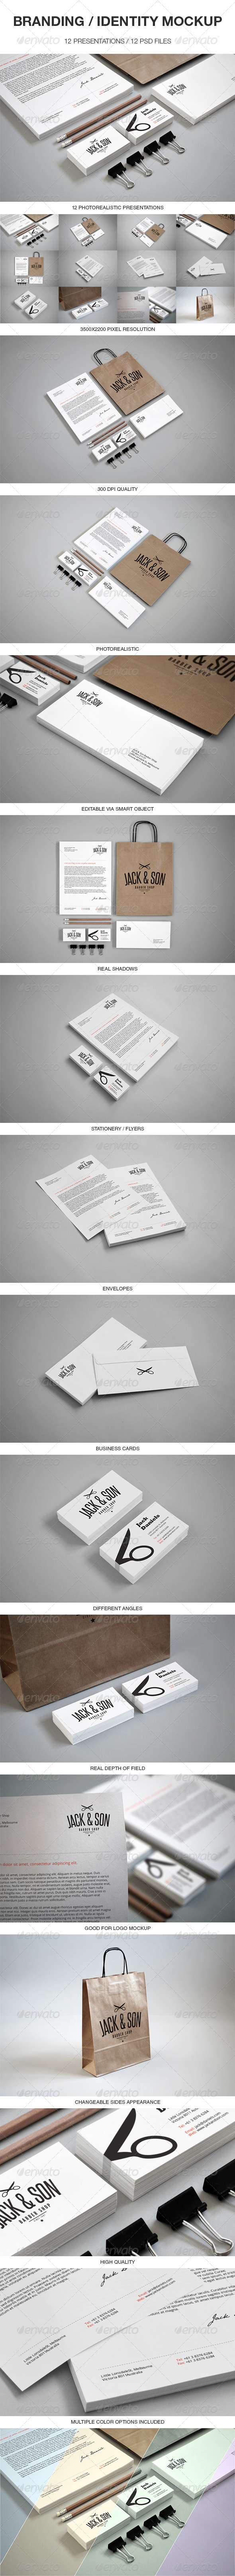 GraphicRiver Branding Identity Mockup 4239103